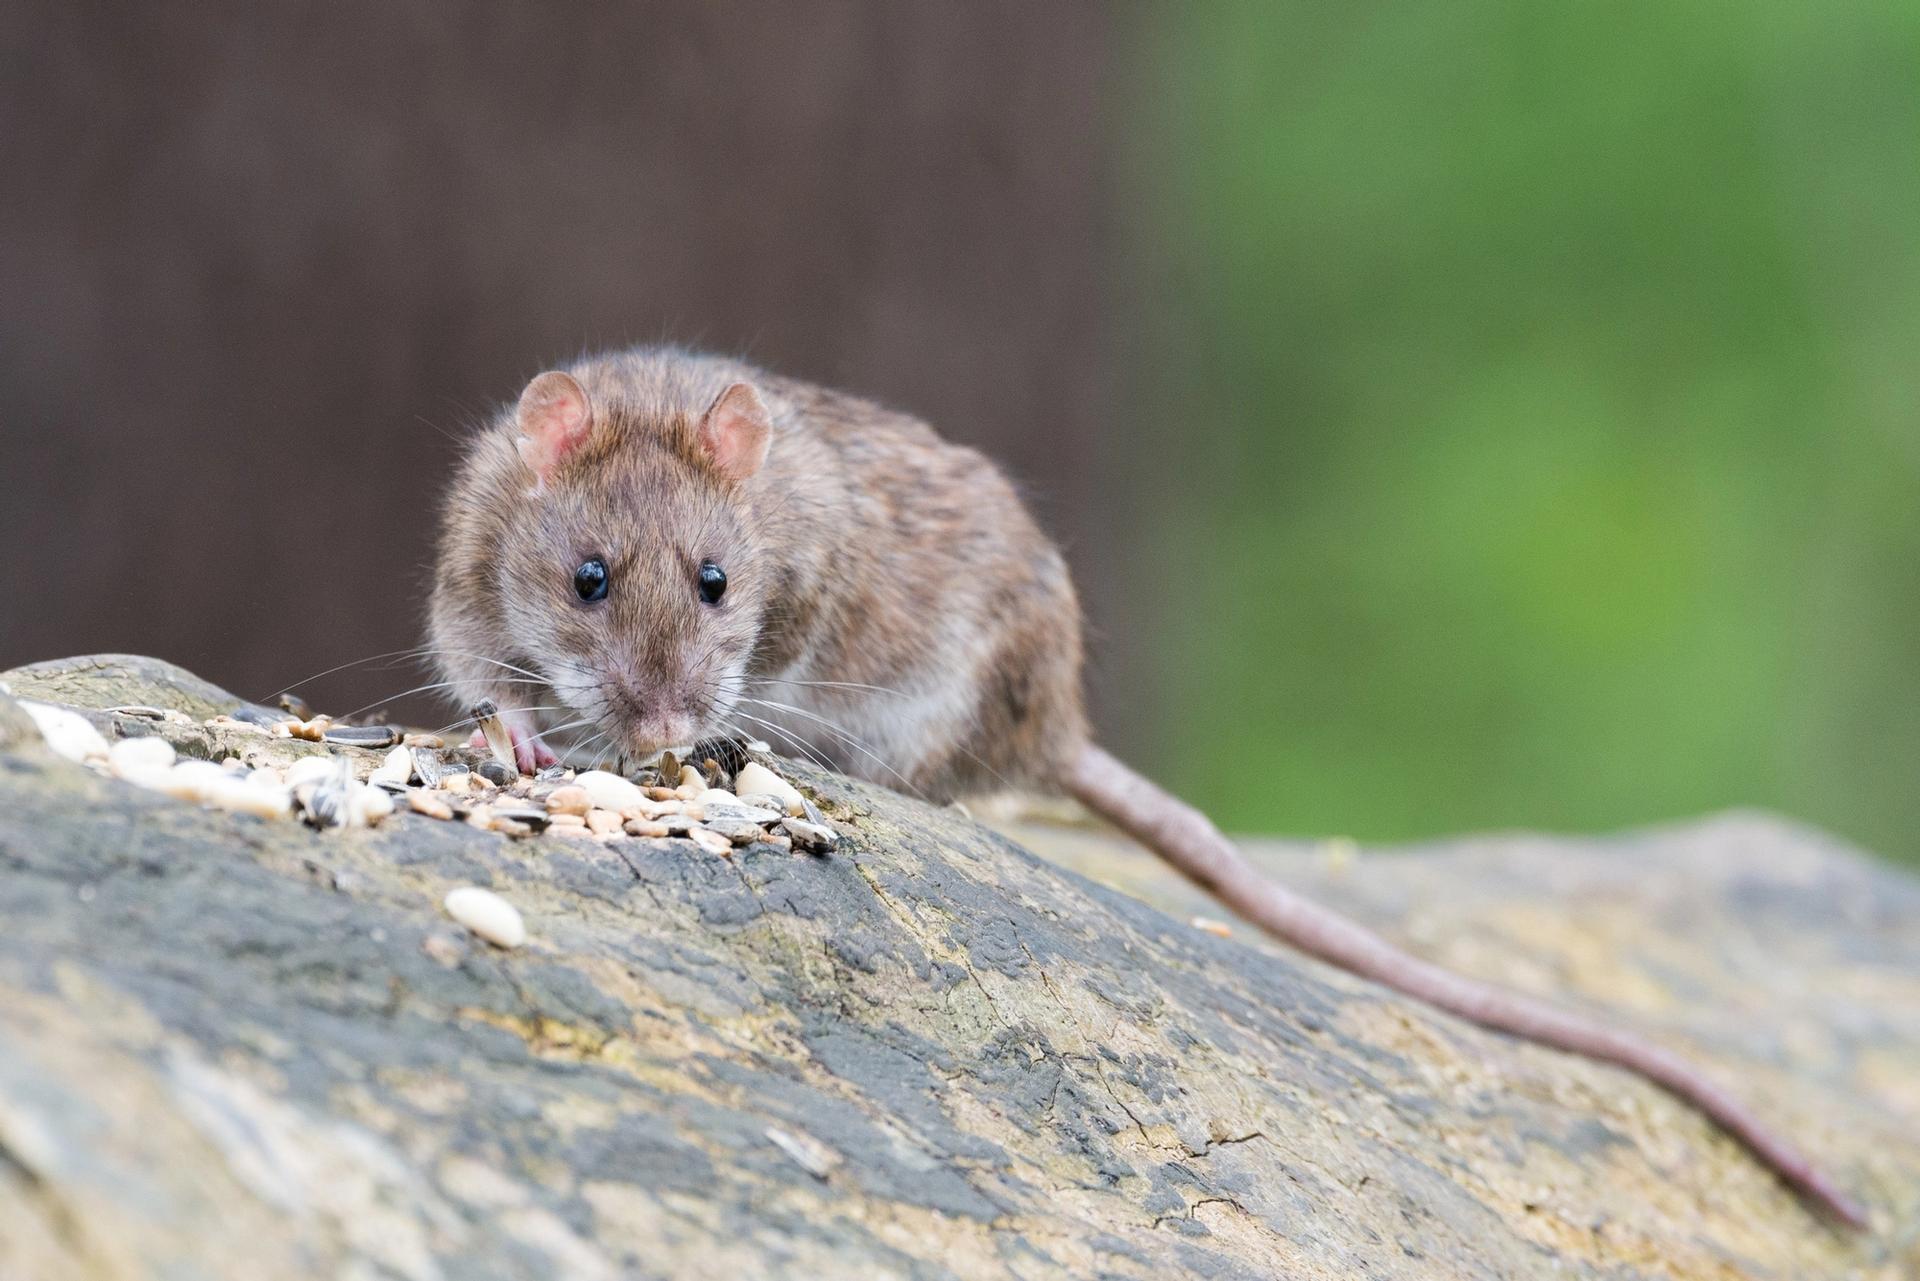 Rattenbefall vorbeugen